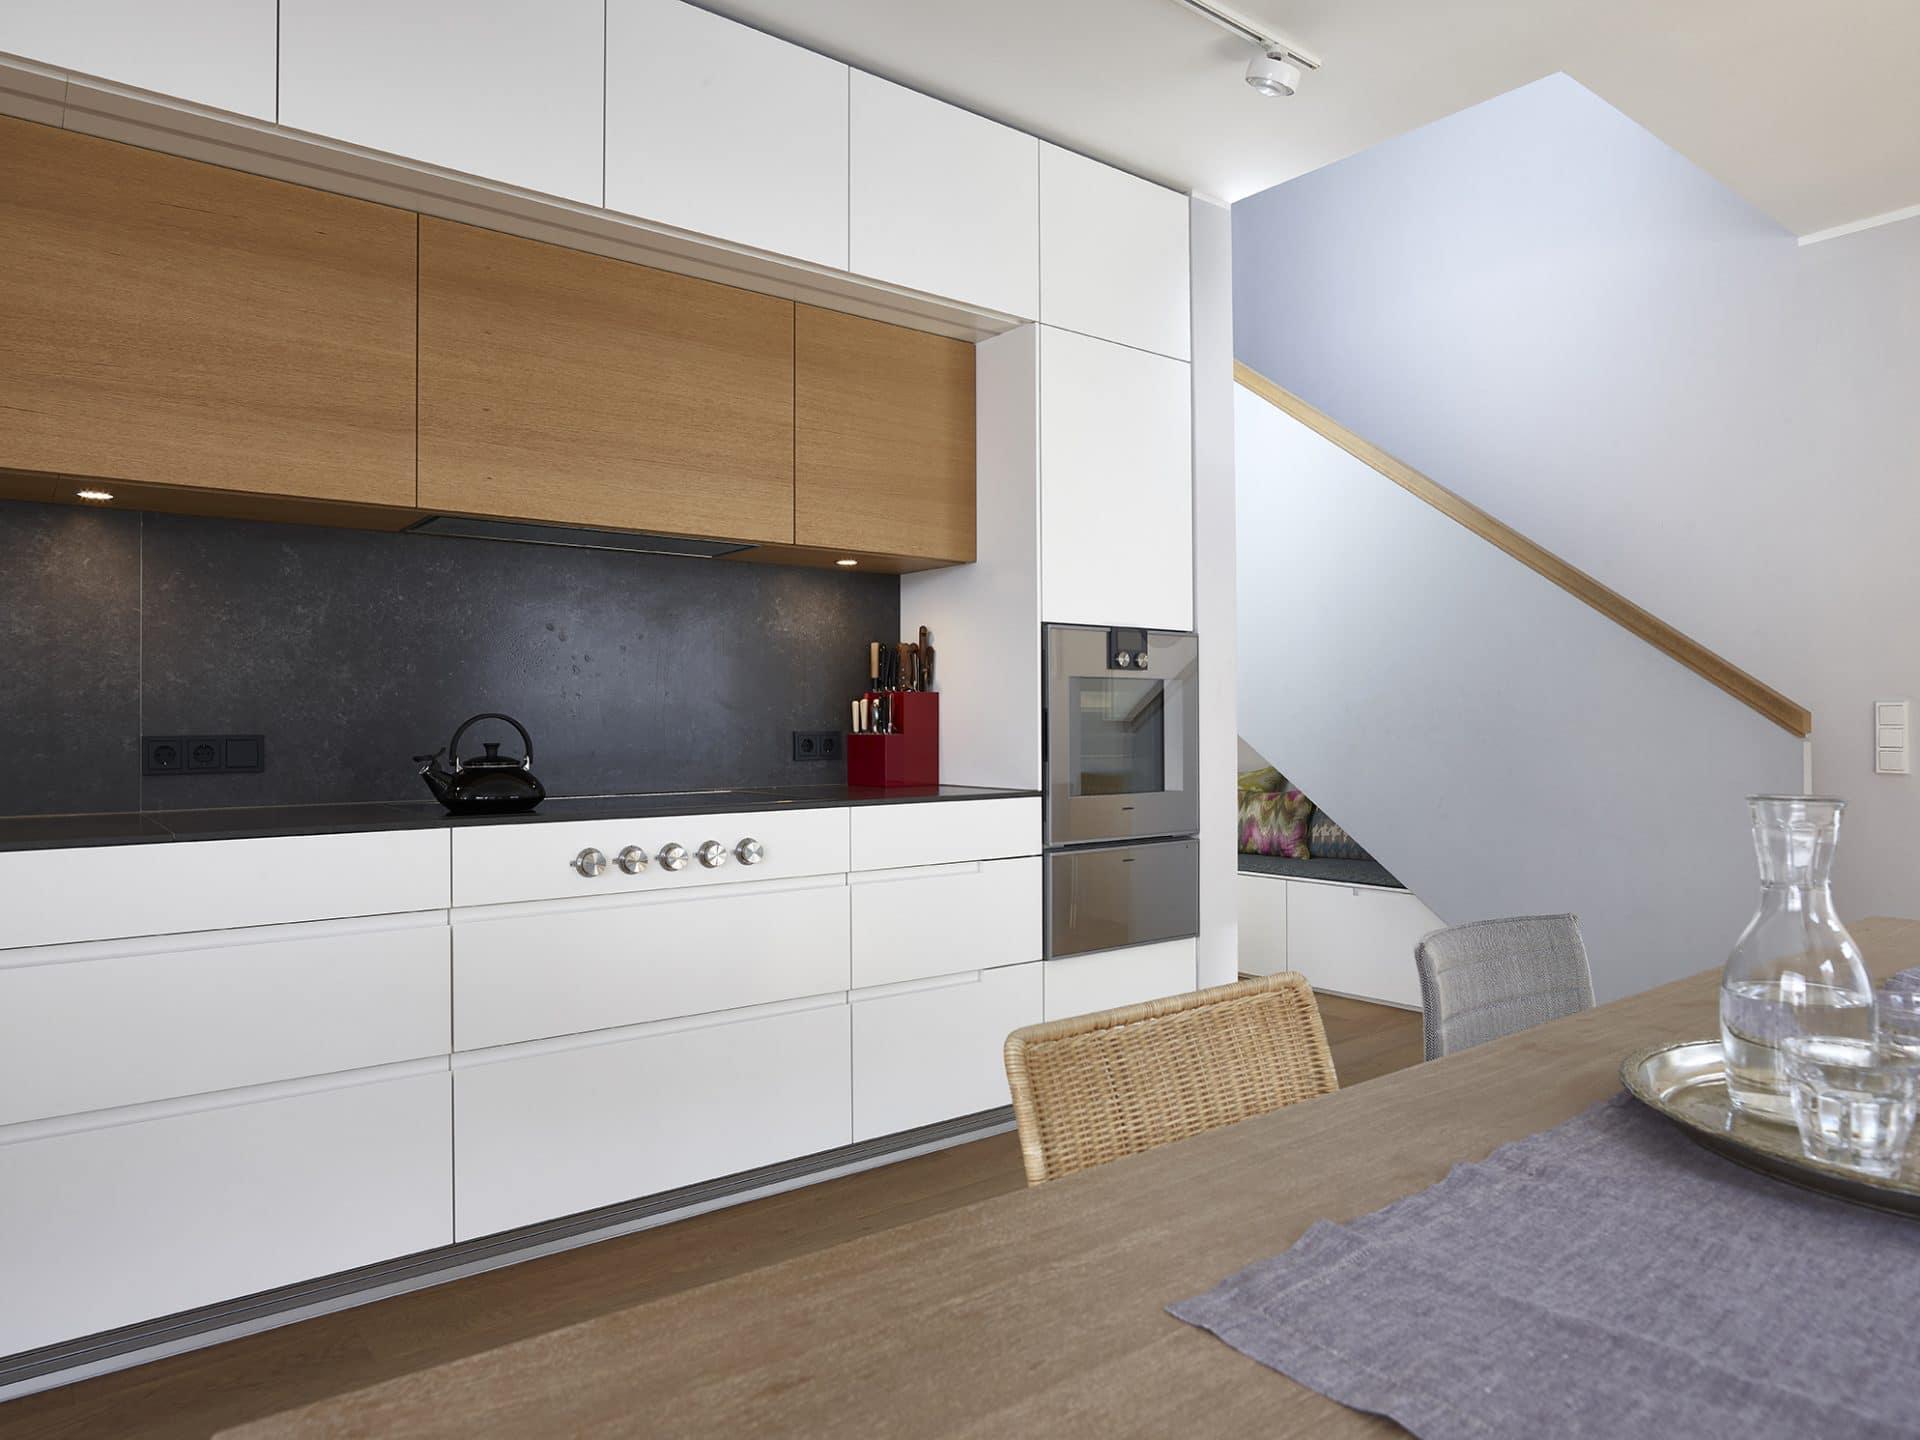 Projekt 06 Innenausbau - Eiche natur + BetonART + Edelstahl